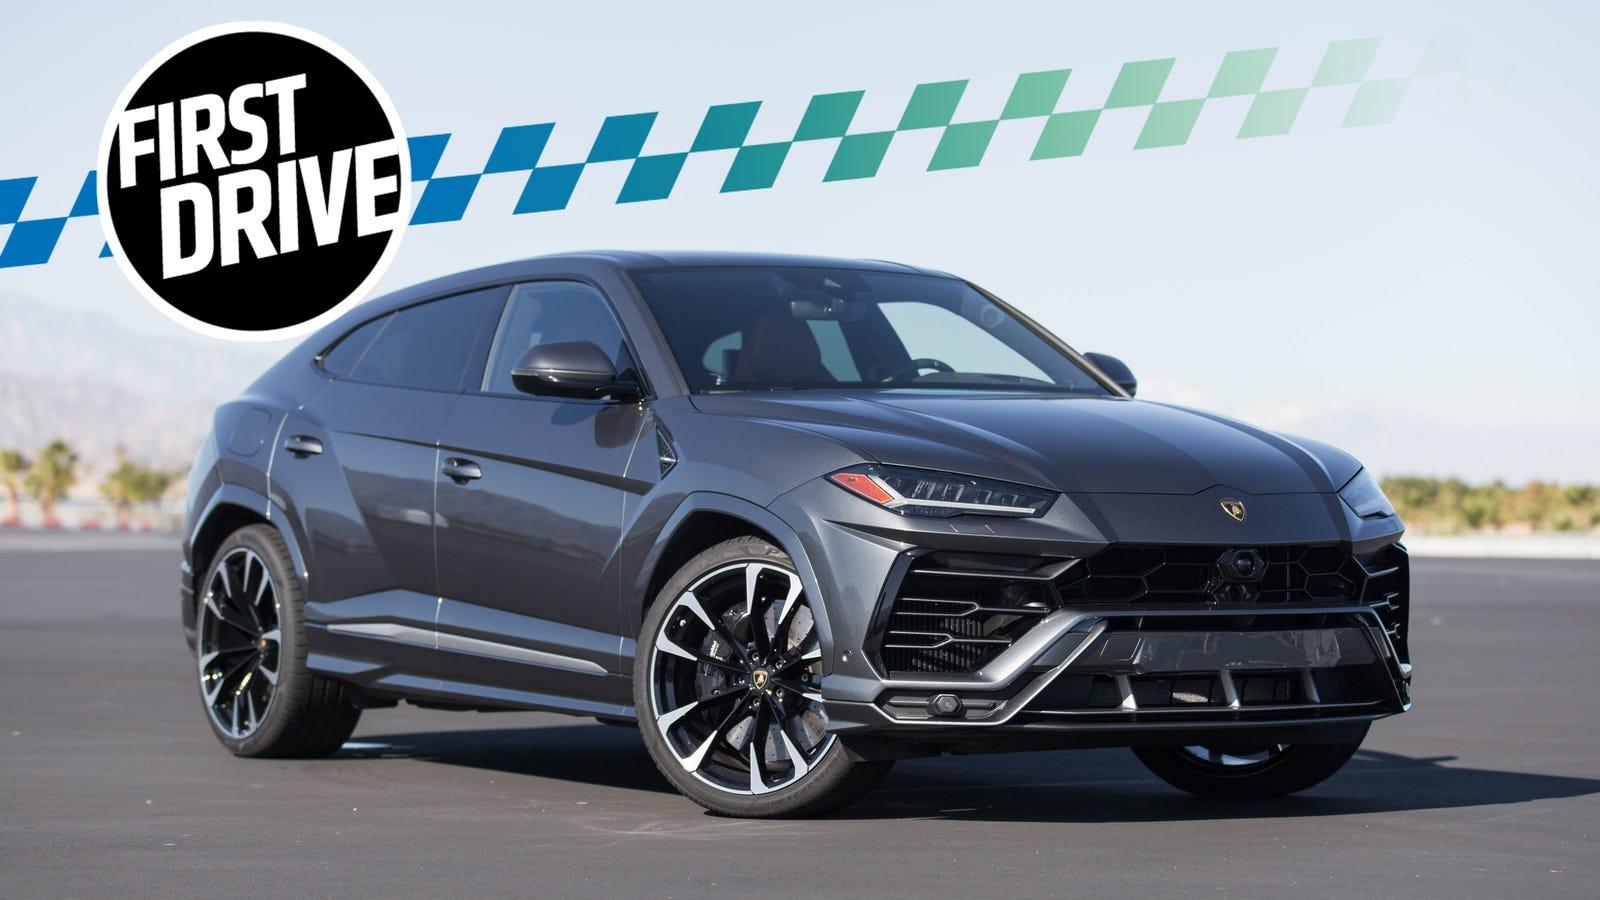 2019 Lamborghini Urus: Design, Engine, Price >> The 2019 Lamborghini Urus Drives Like The Vengeful King Of